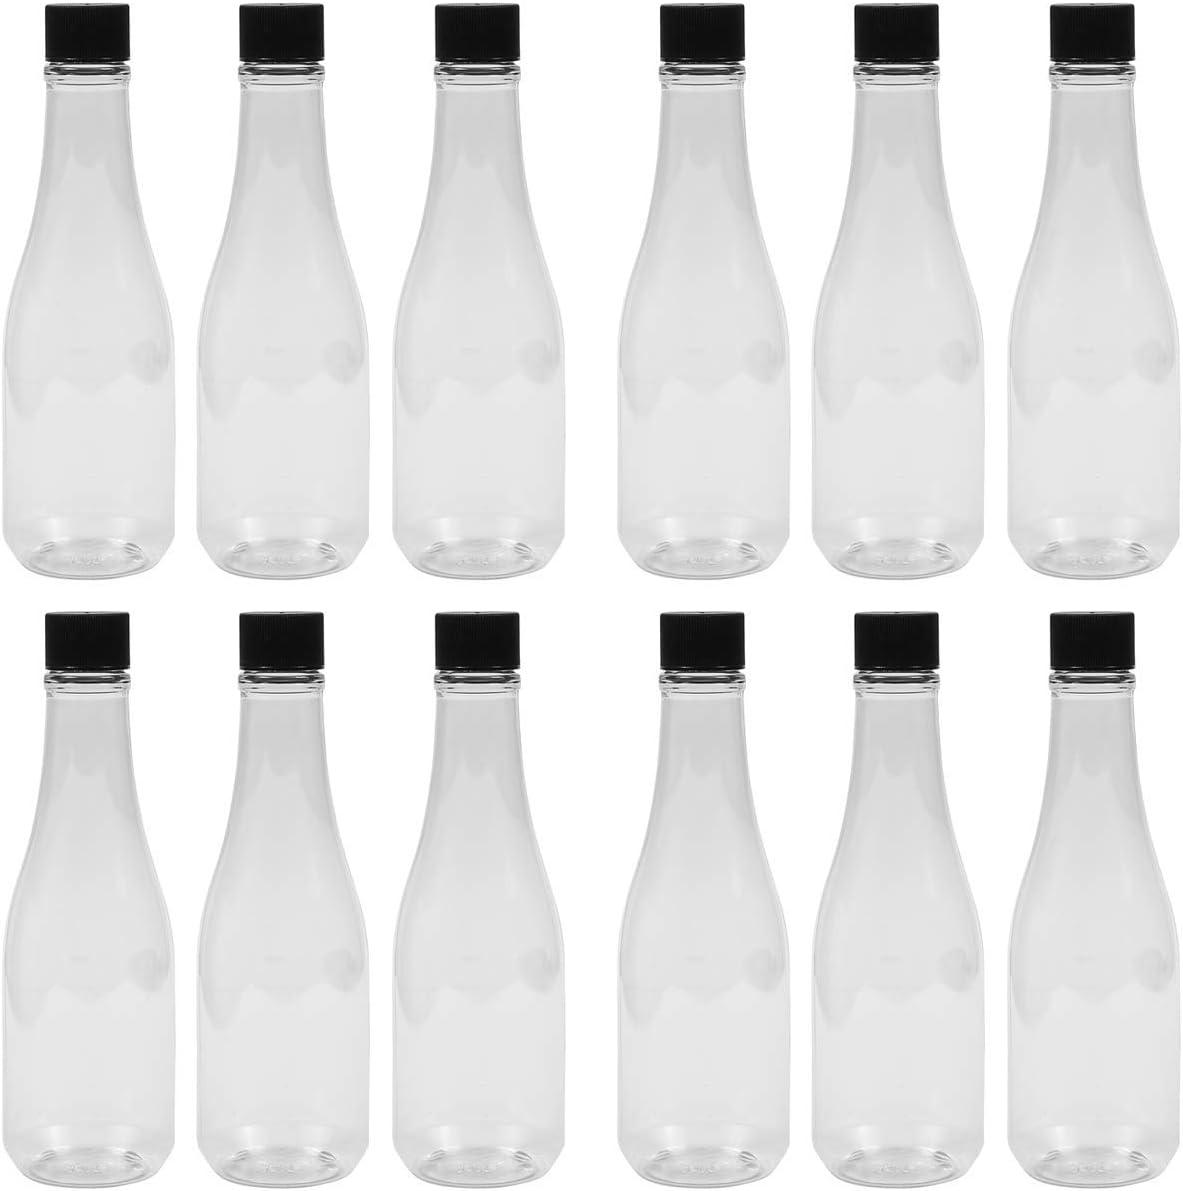 PEXALE 8 OZ Plastic pet Ranking TOP5 HOT caps Woozy 12 Kansas City Mall Black Bottles Sauce